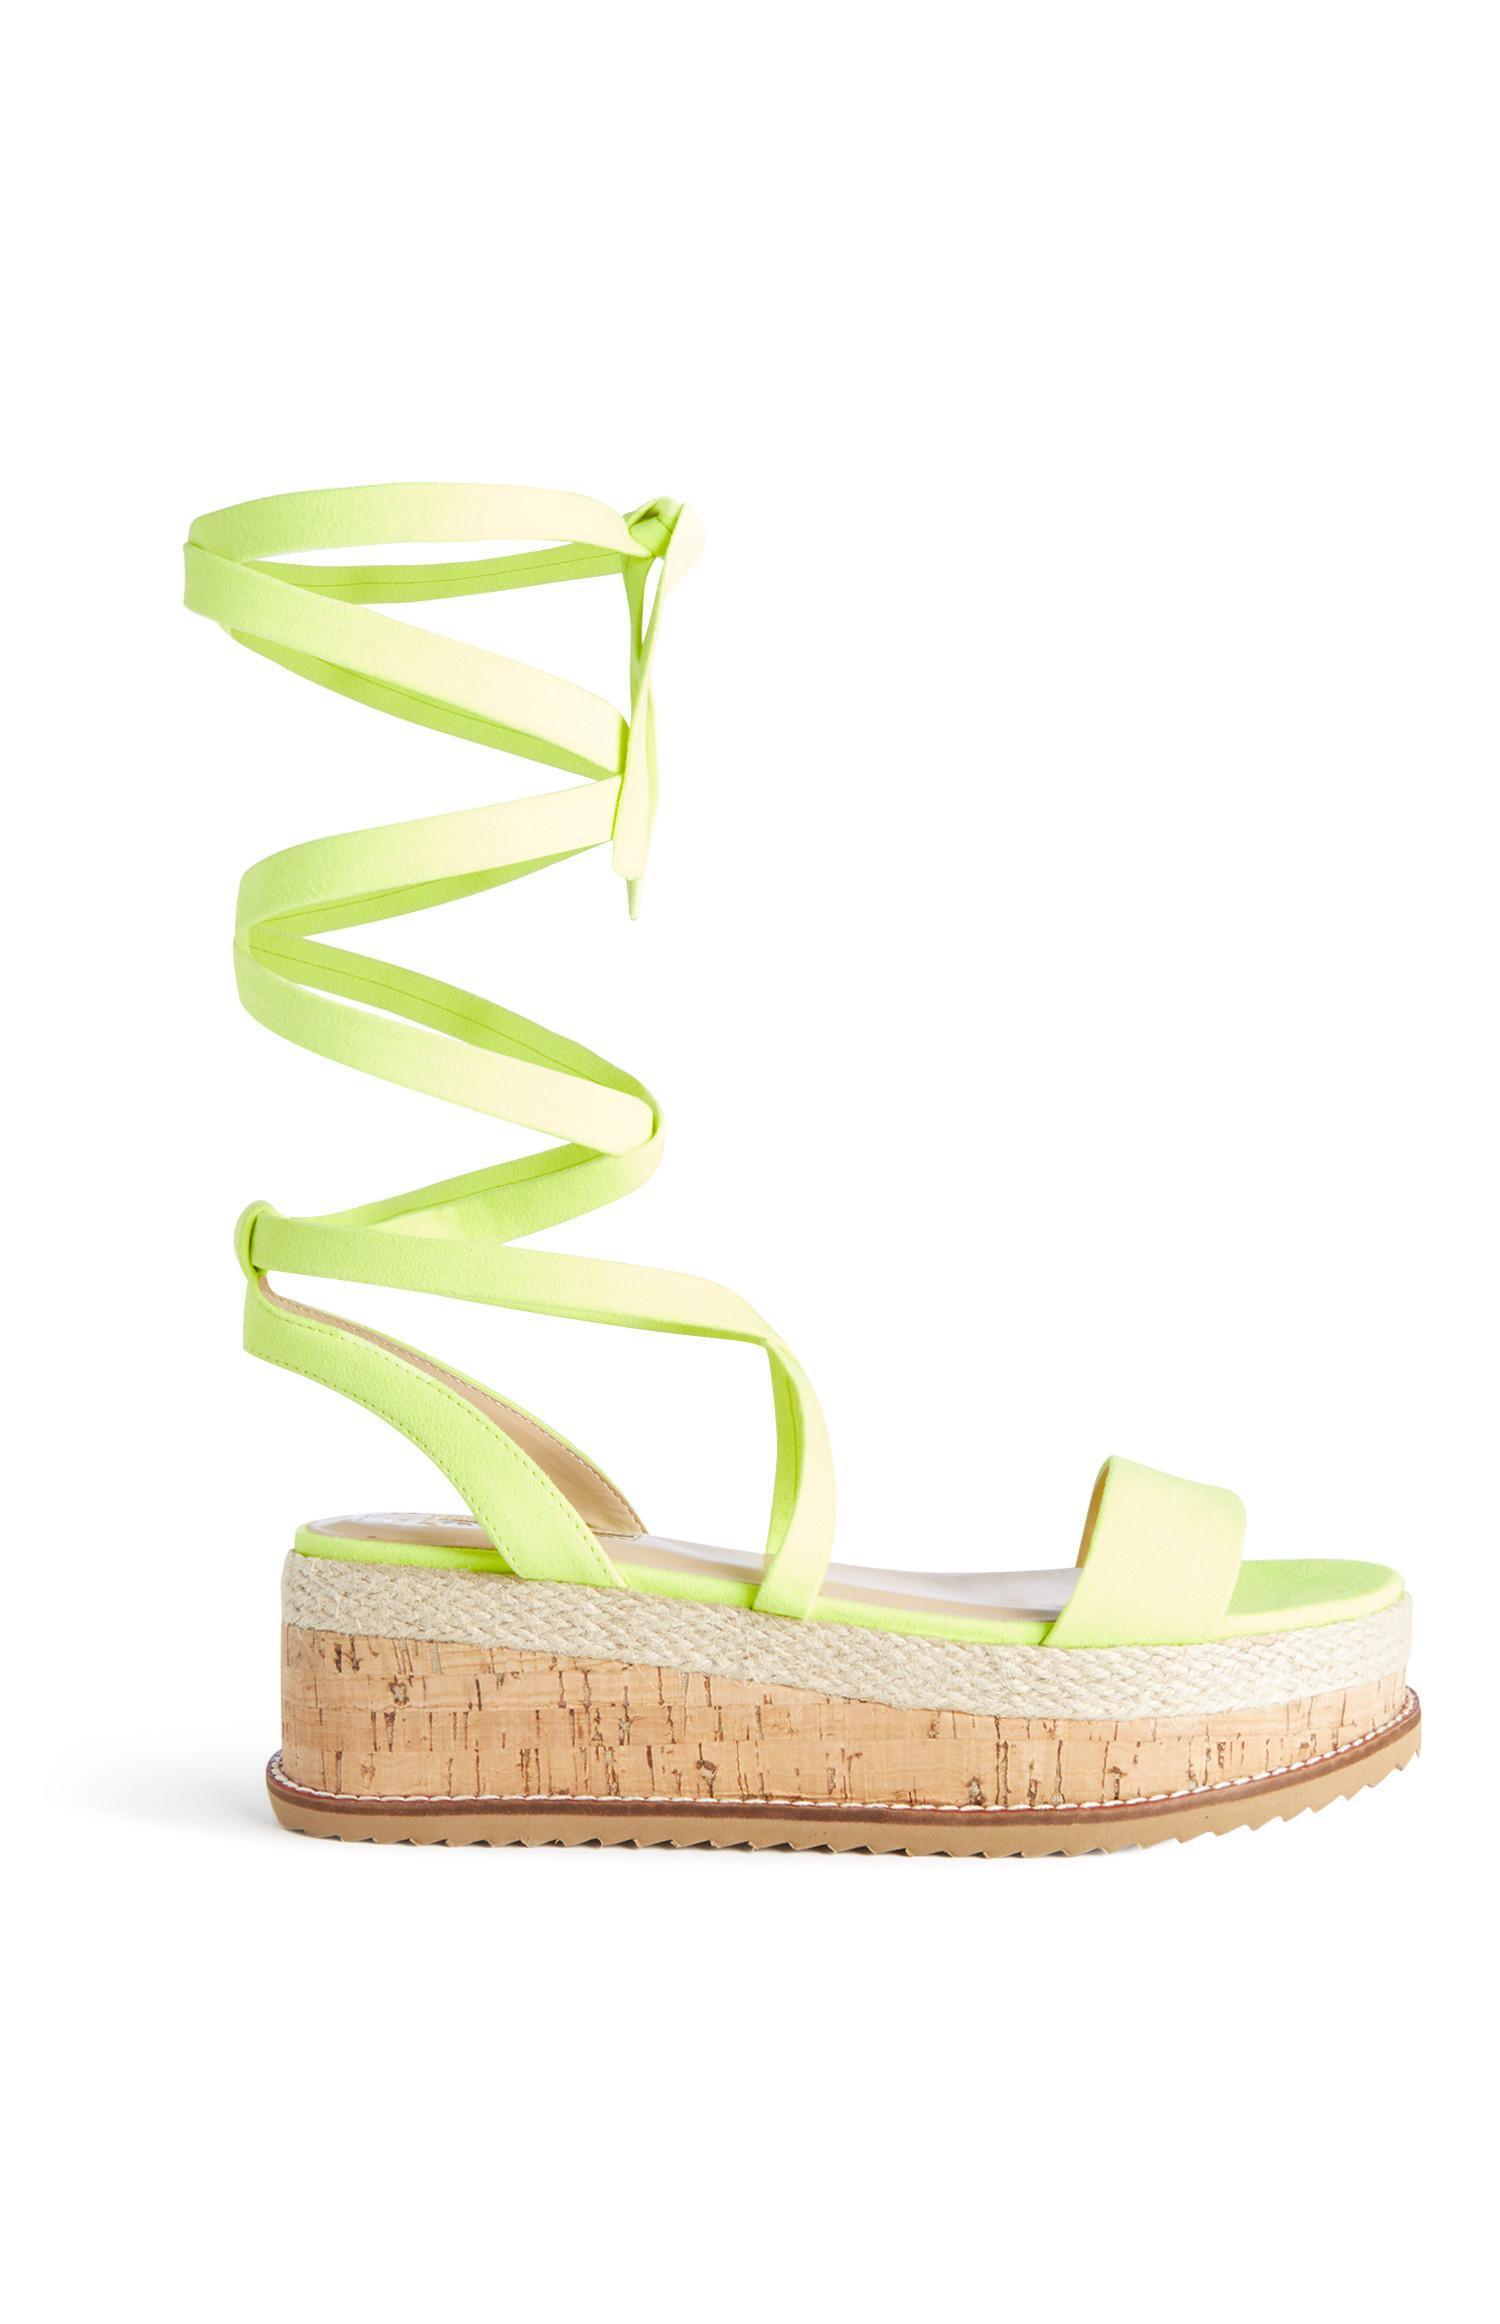 Neon Yellow Tie Up Flatform Sandal